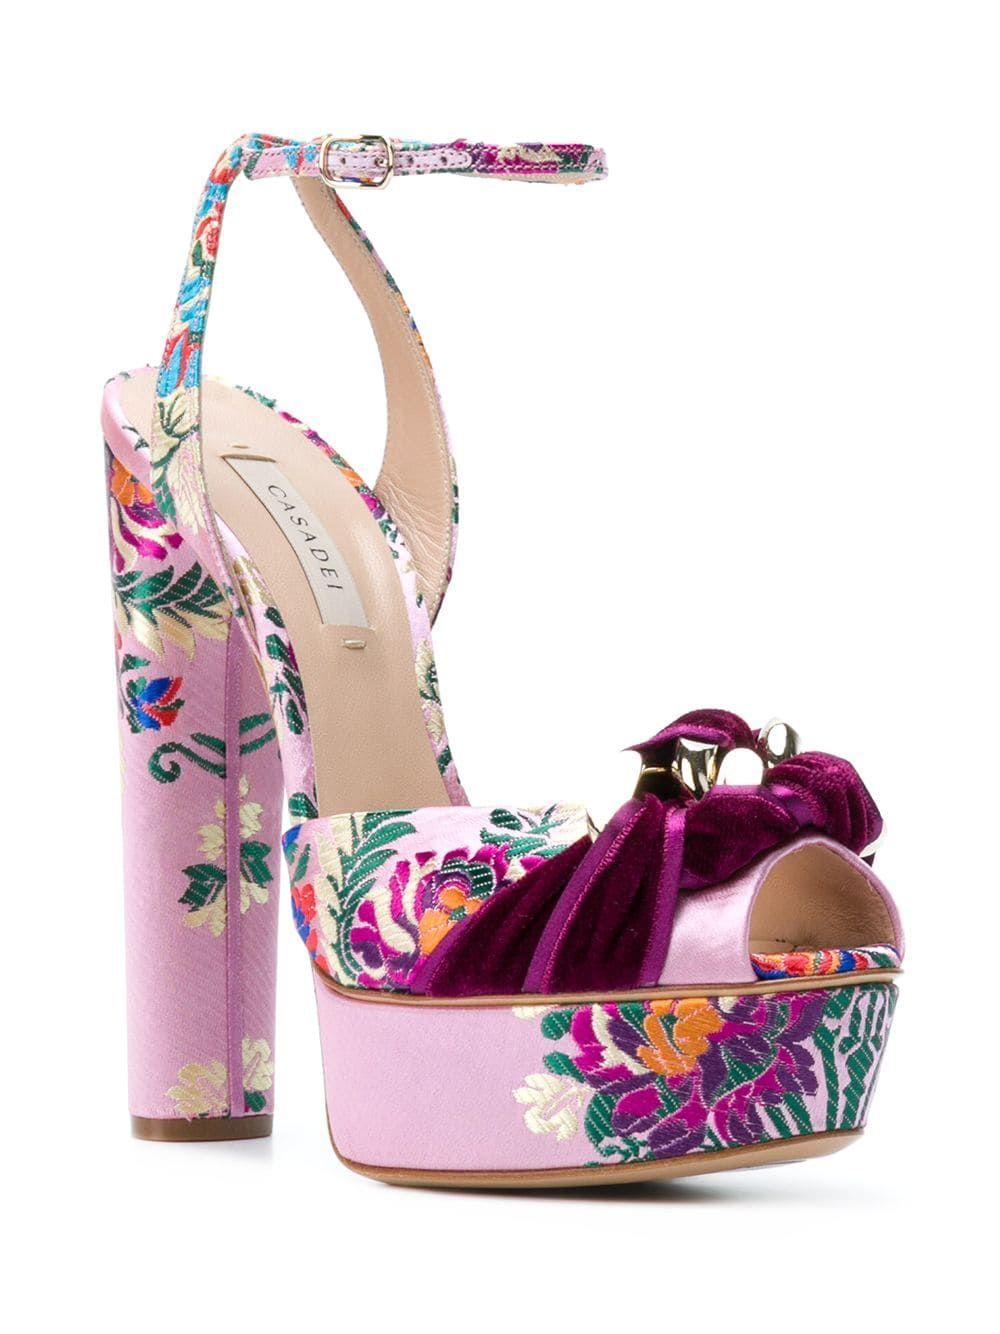 Hot Womens Open Toe Floral Embroidery Platform Wedge Heel Shoes Sandal Slingback